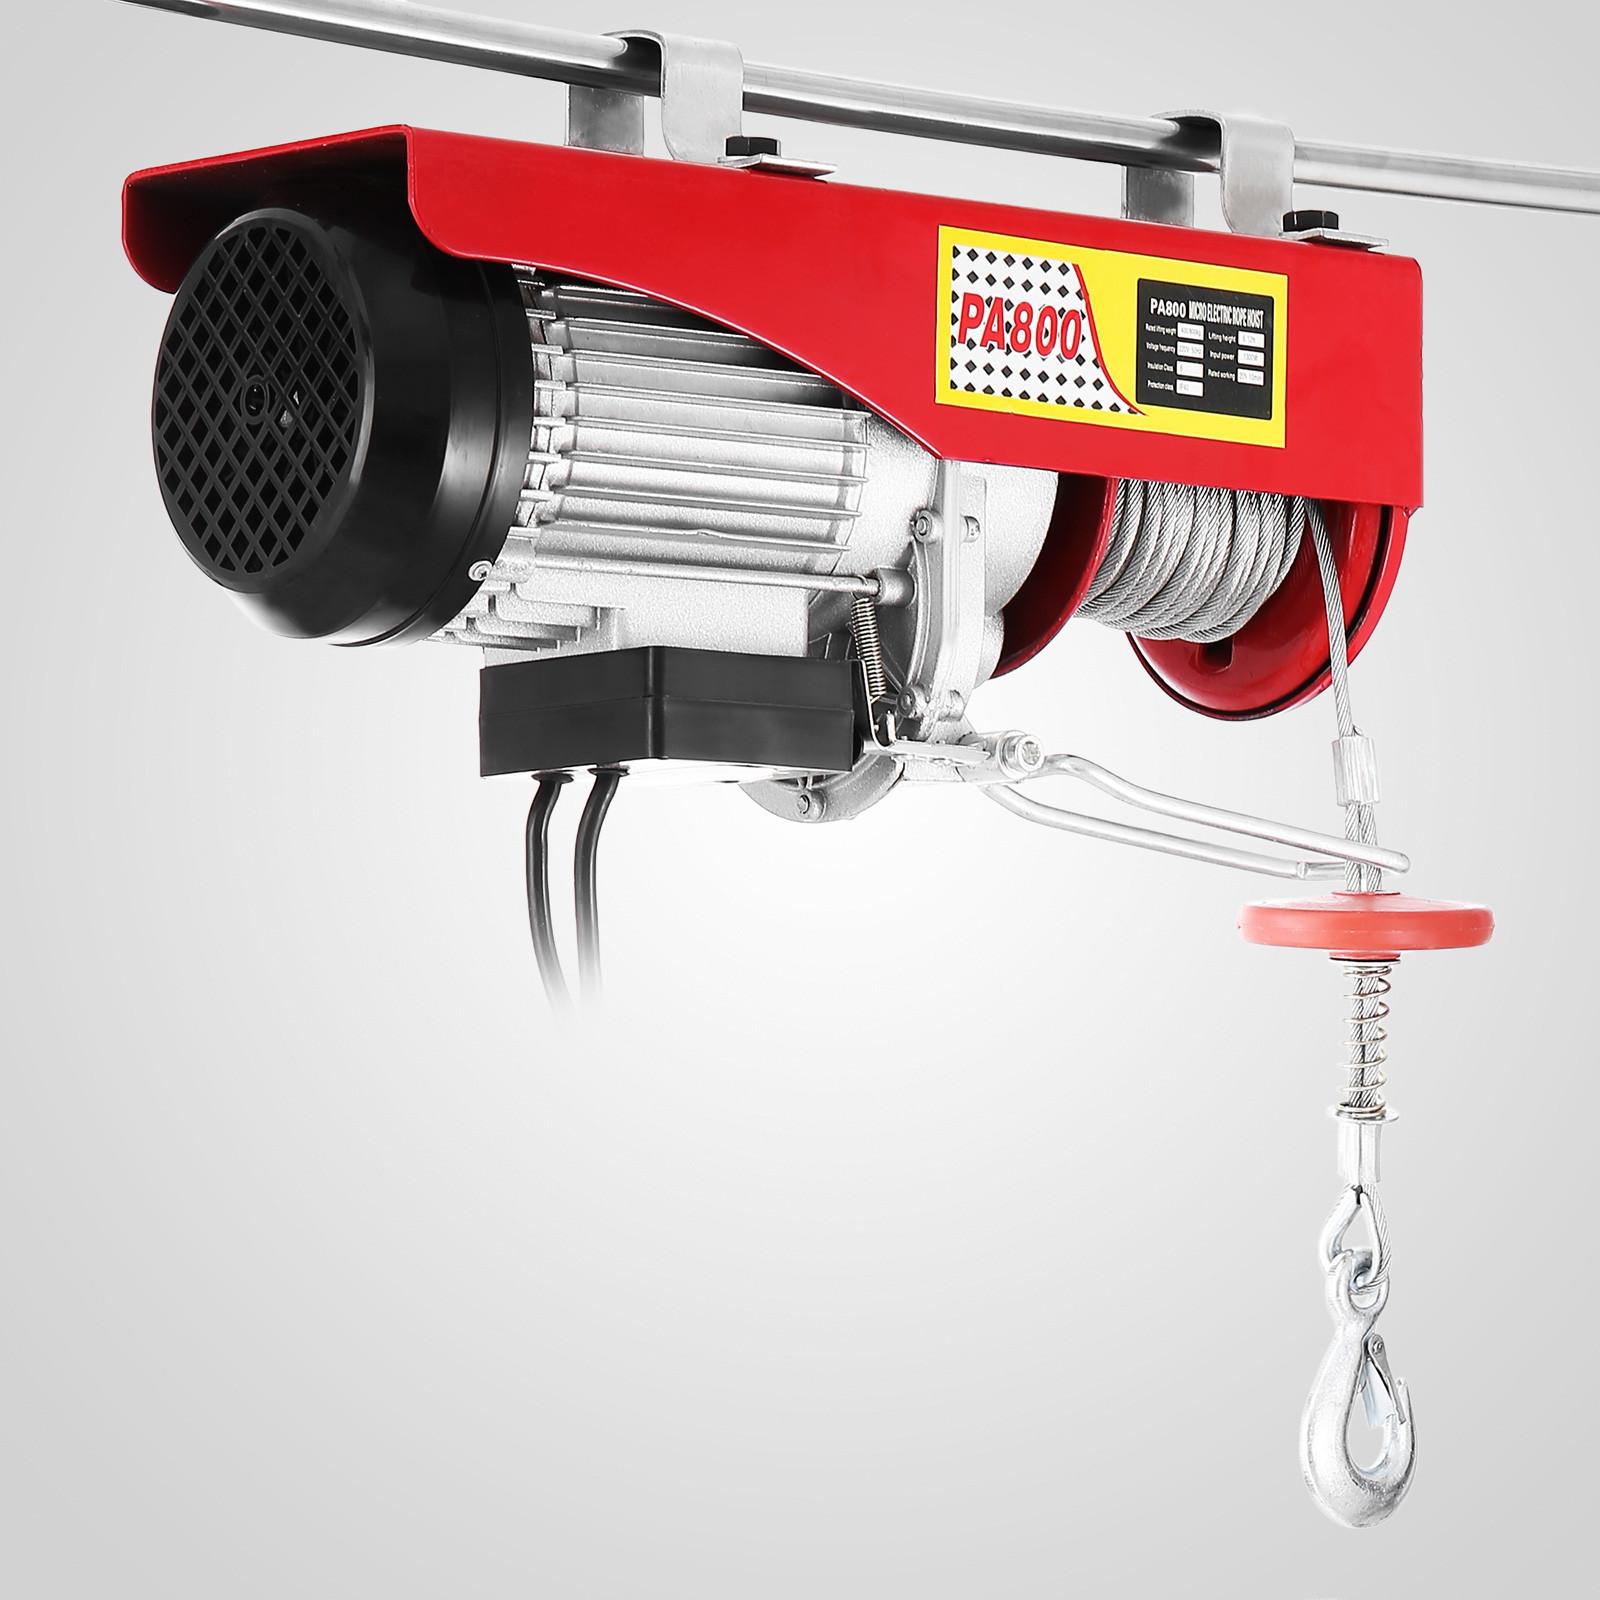 100kg-900kg-Electric-Hoist-Winch-Lifting-Engine-Crane-Cable-Lift-Hook-Garage miniature 53